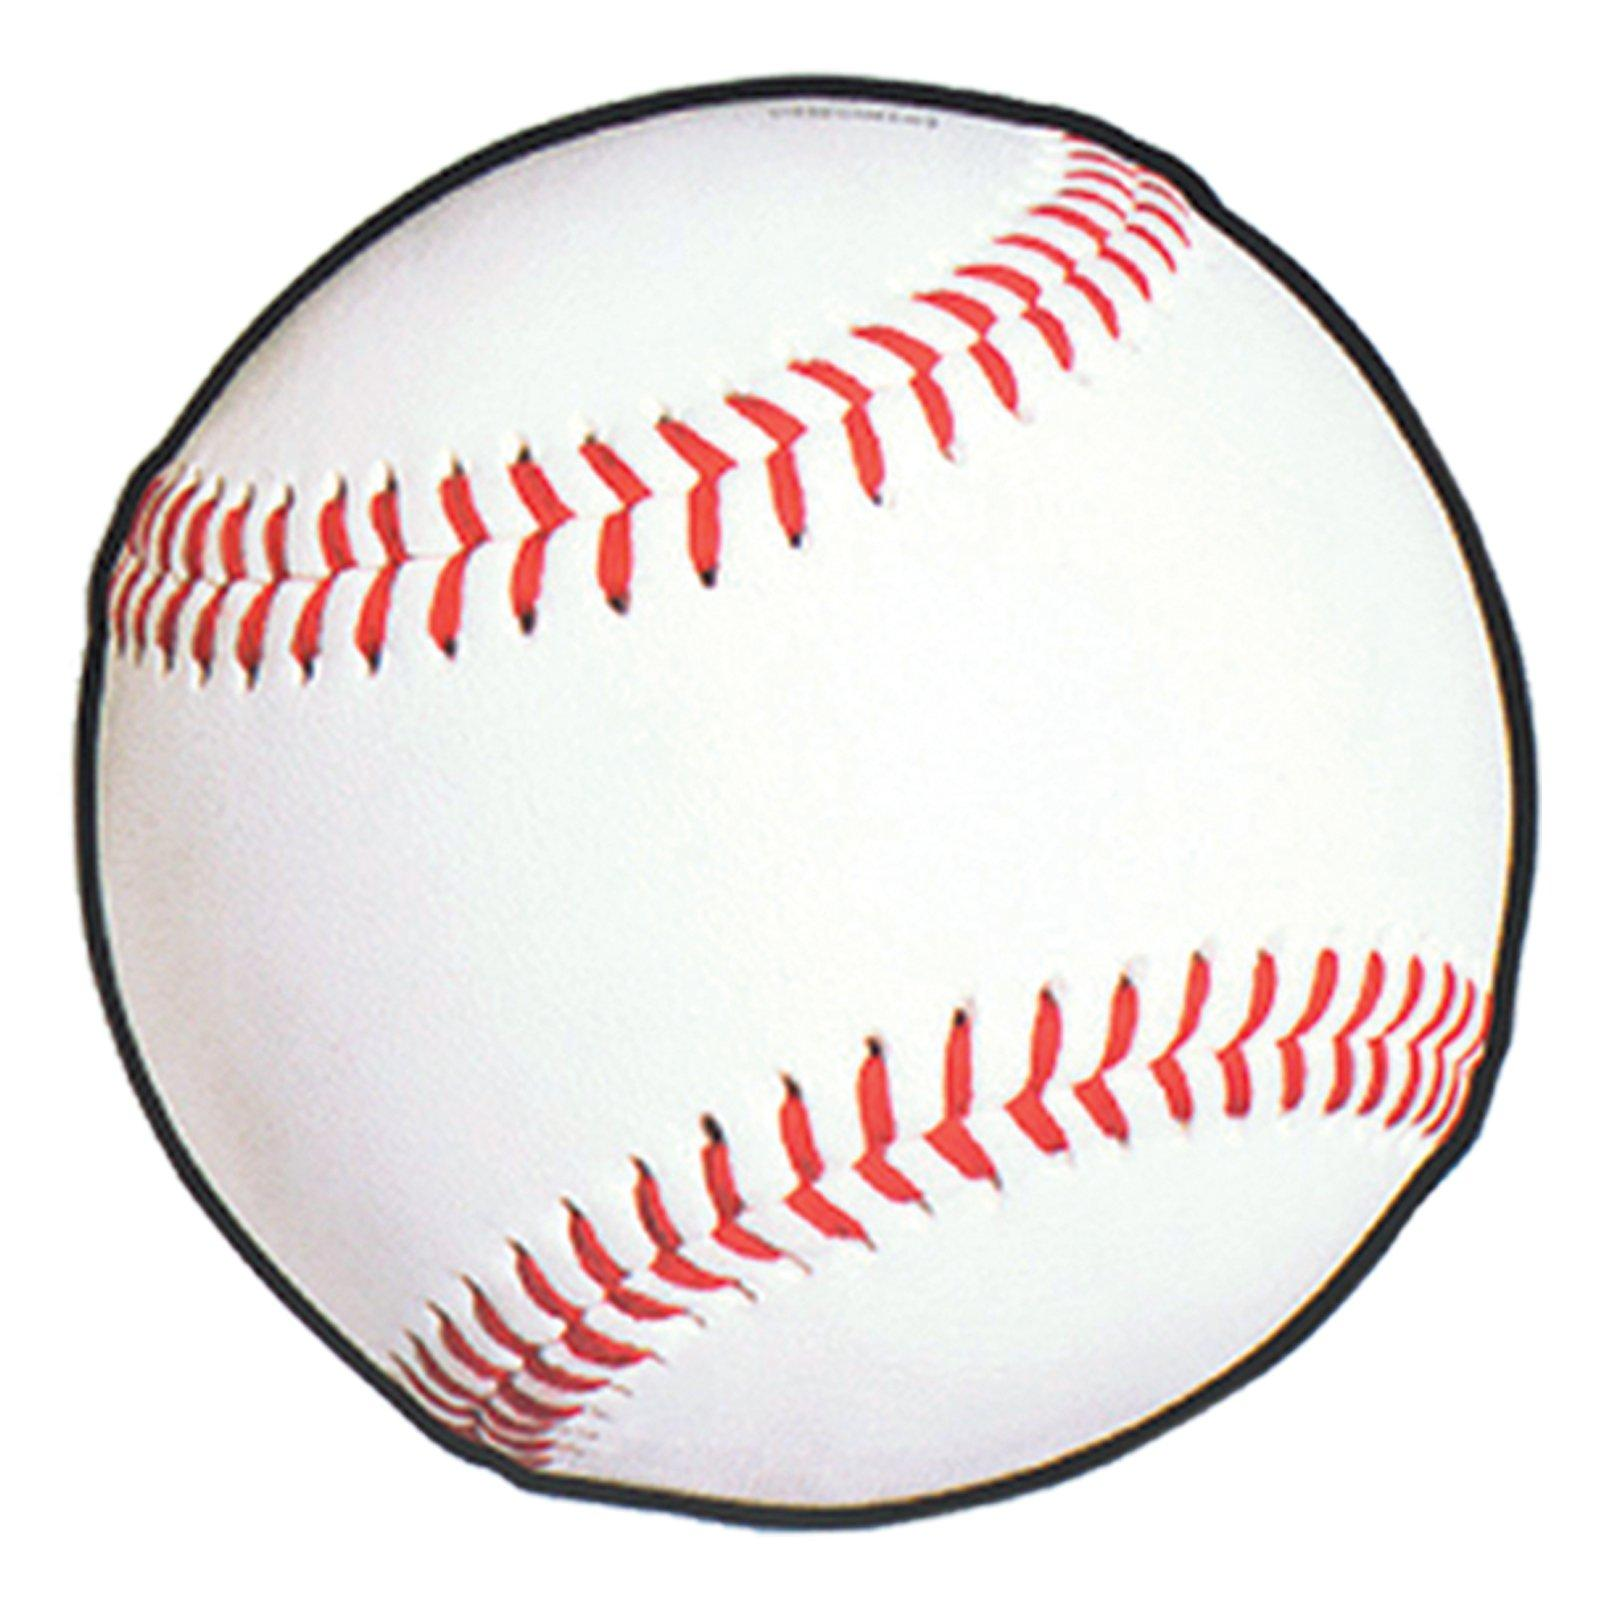 Baseball Clipart Free Free Clip Art Images Image